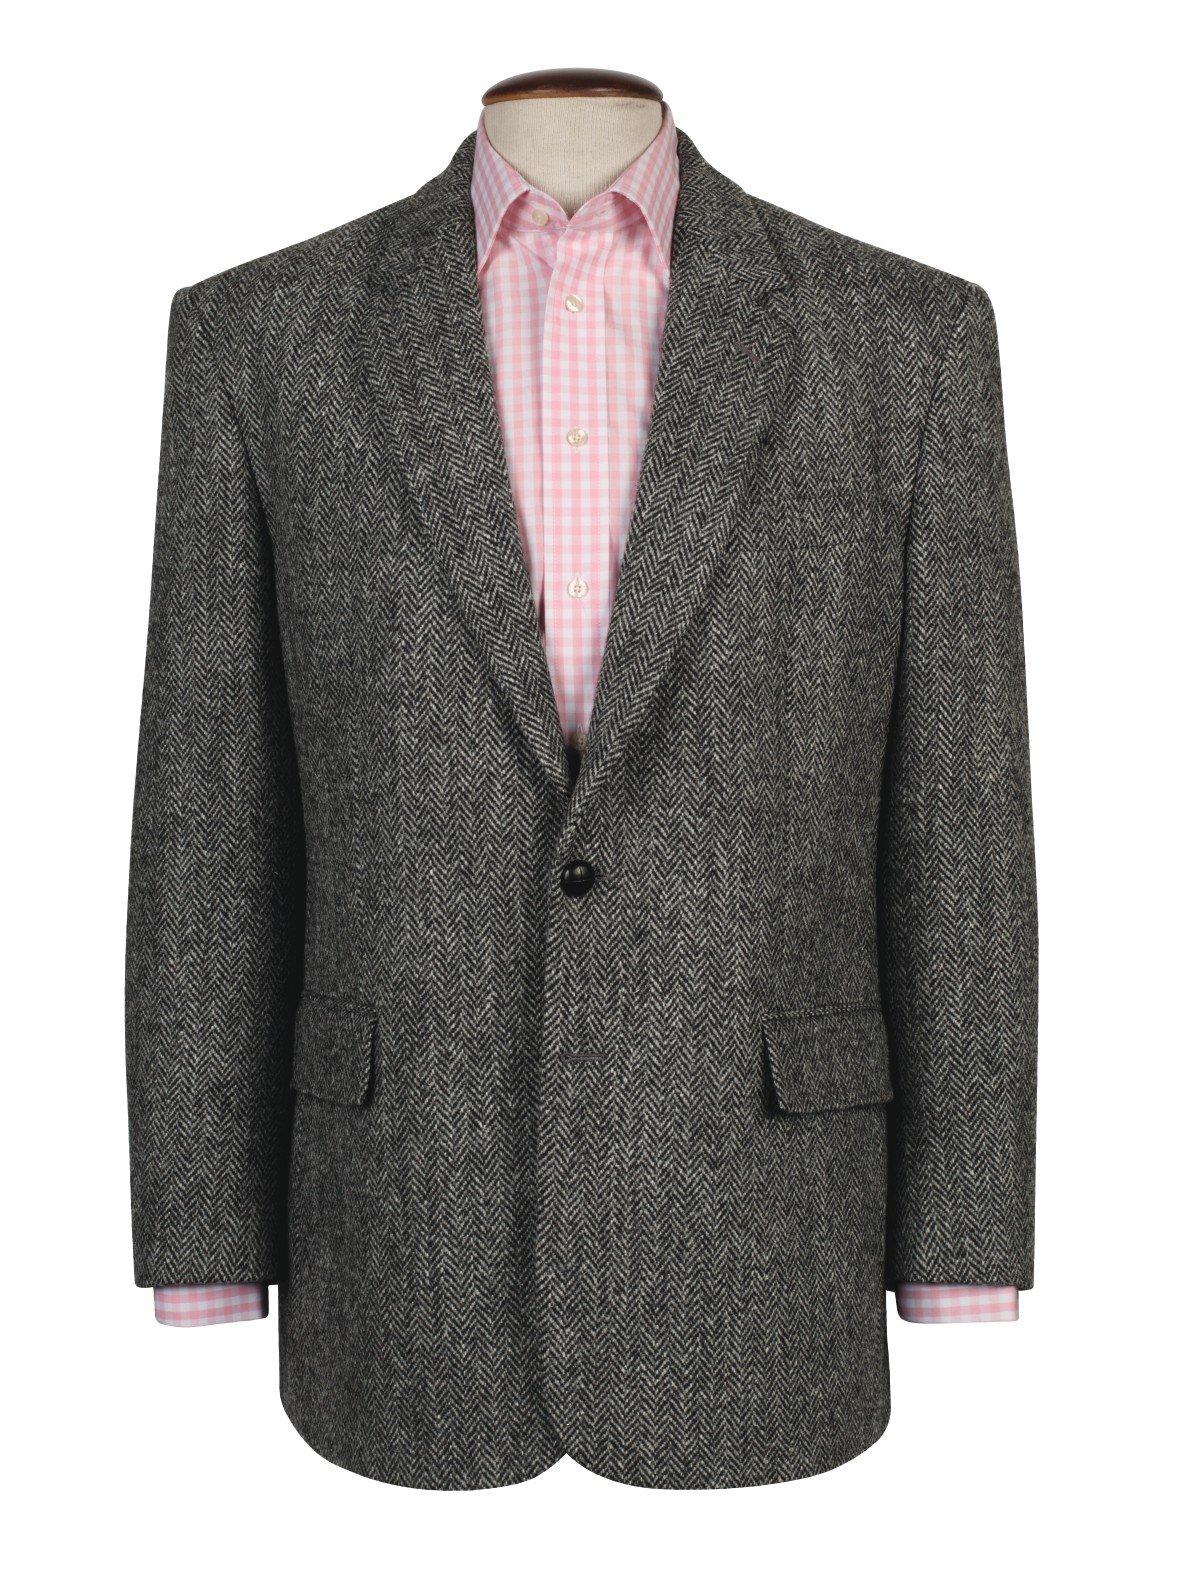 The Fine Swine Men's Harris Tweed Jacket Laxdale 40 Long Green mix